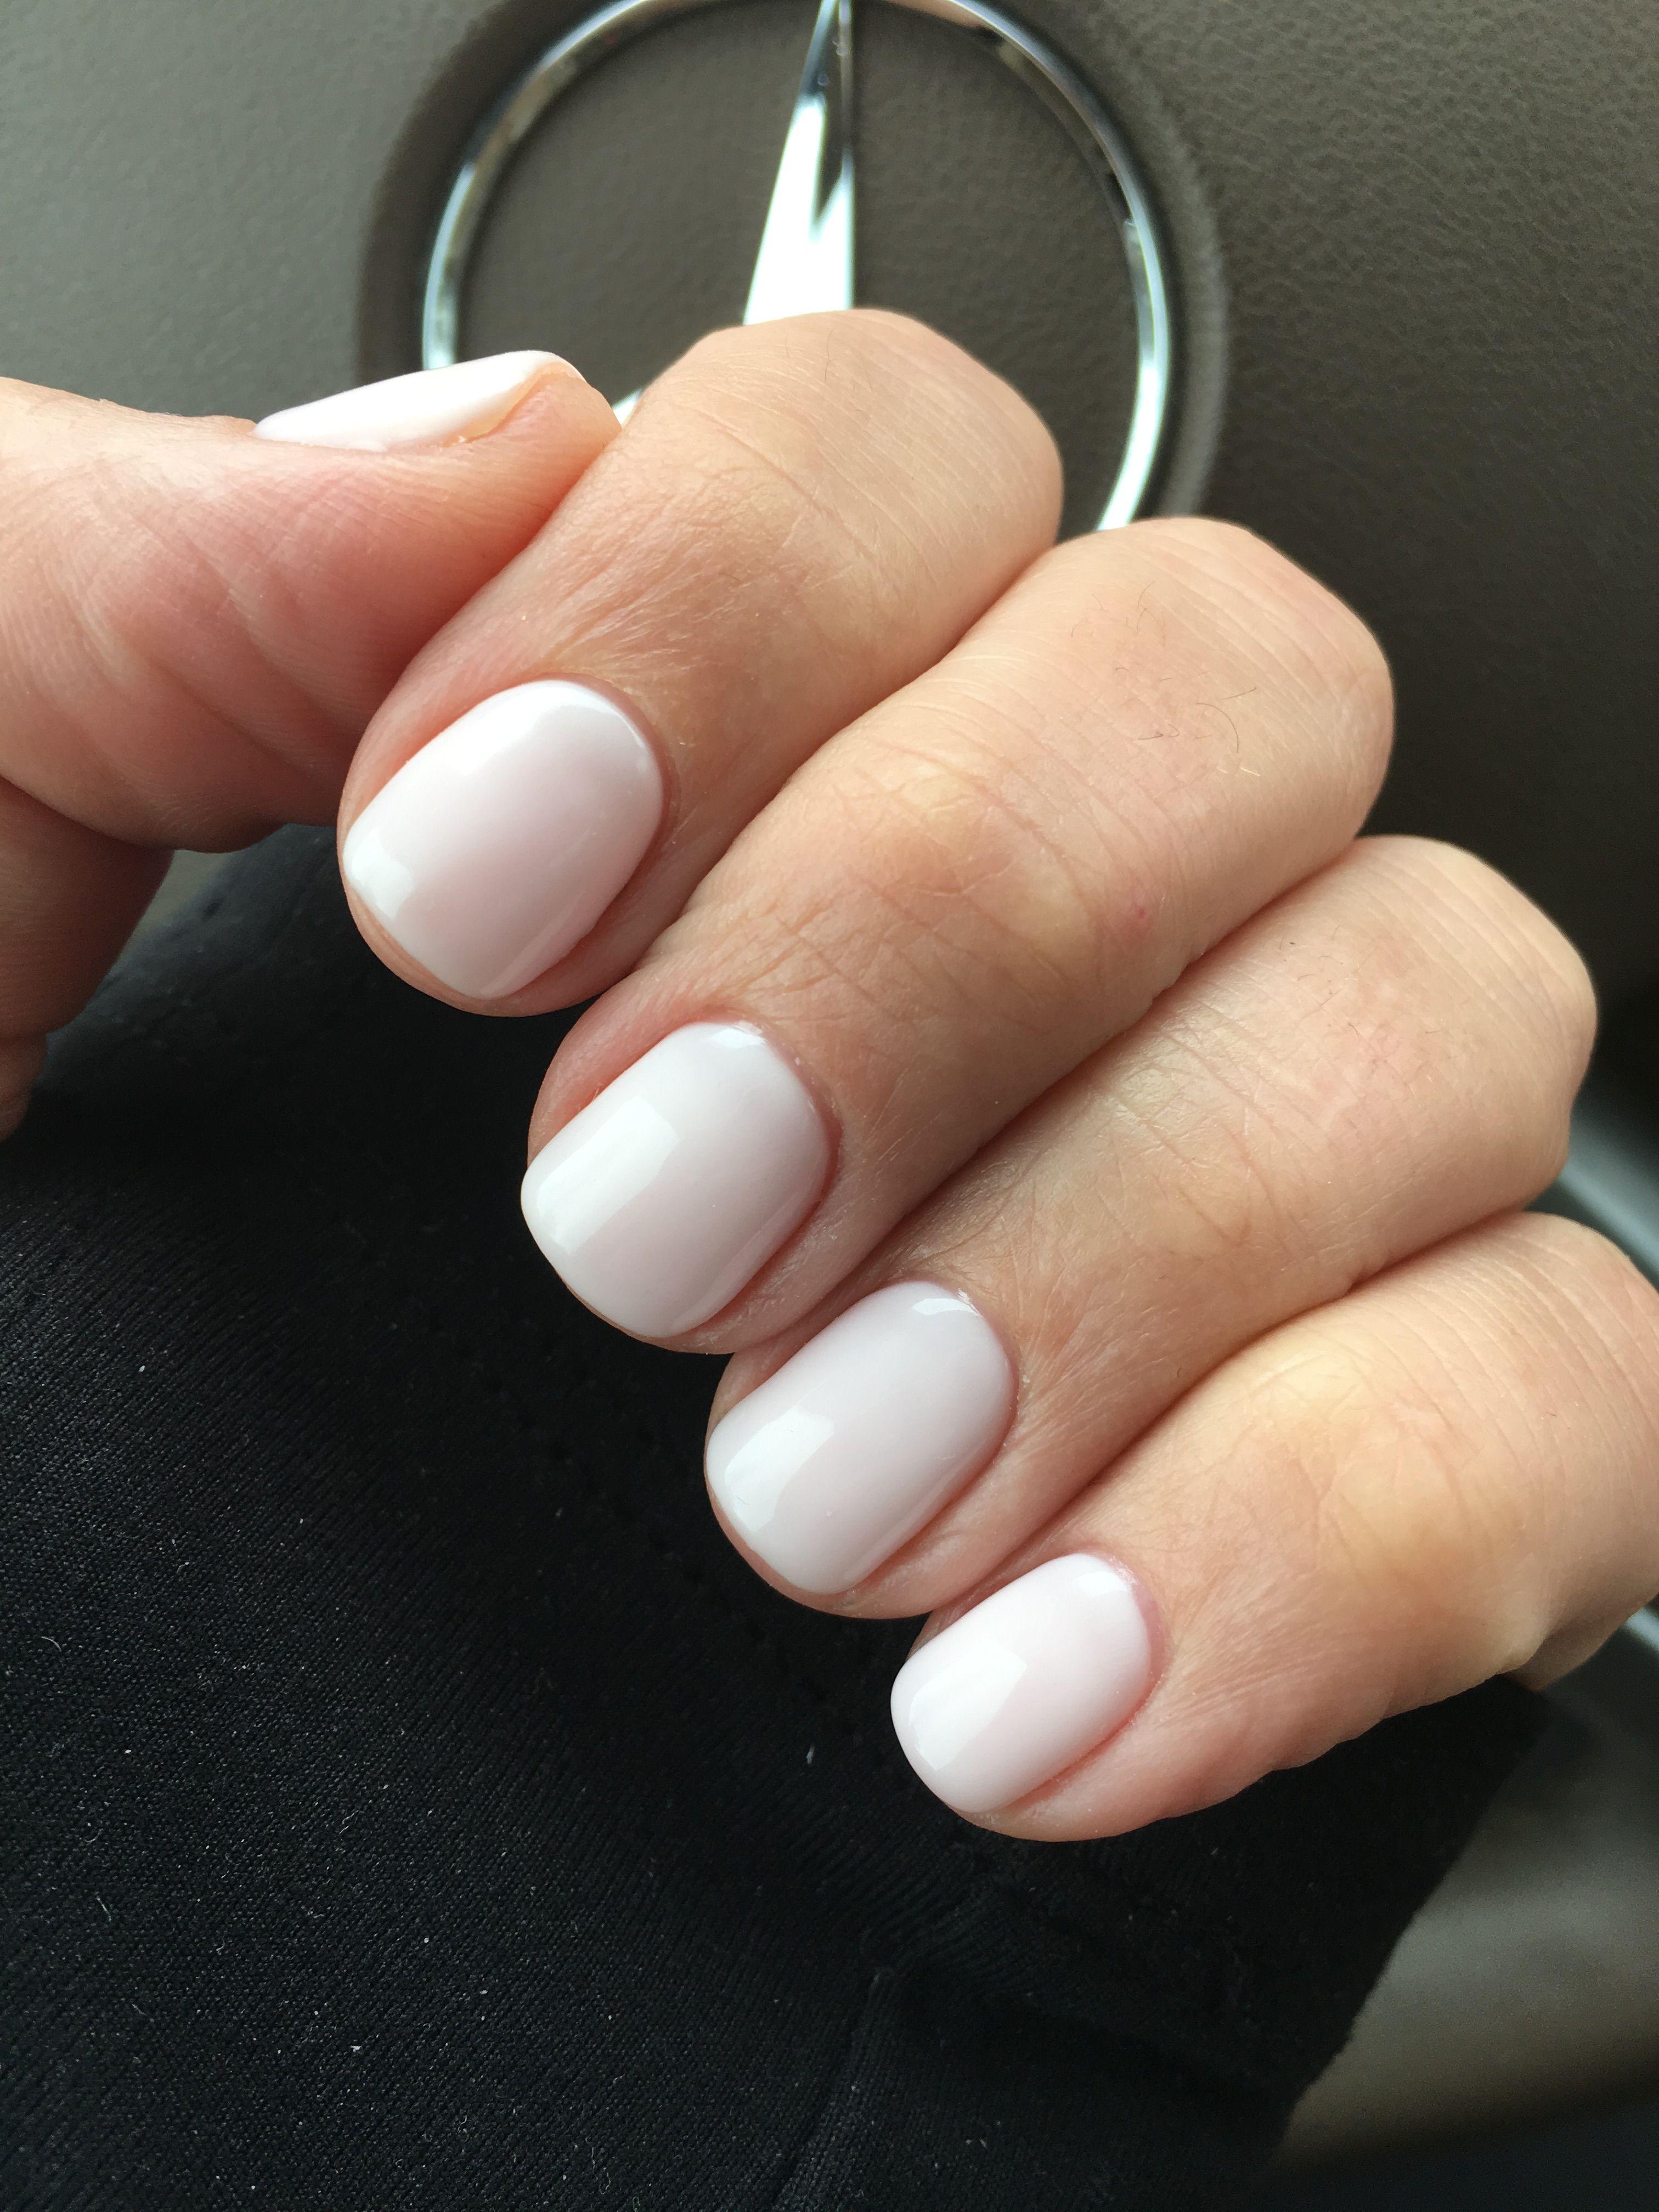 Cnd Romantique Hair And Nails White Shellac Nails Kathy Nails